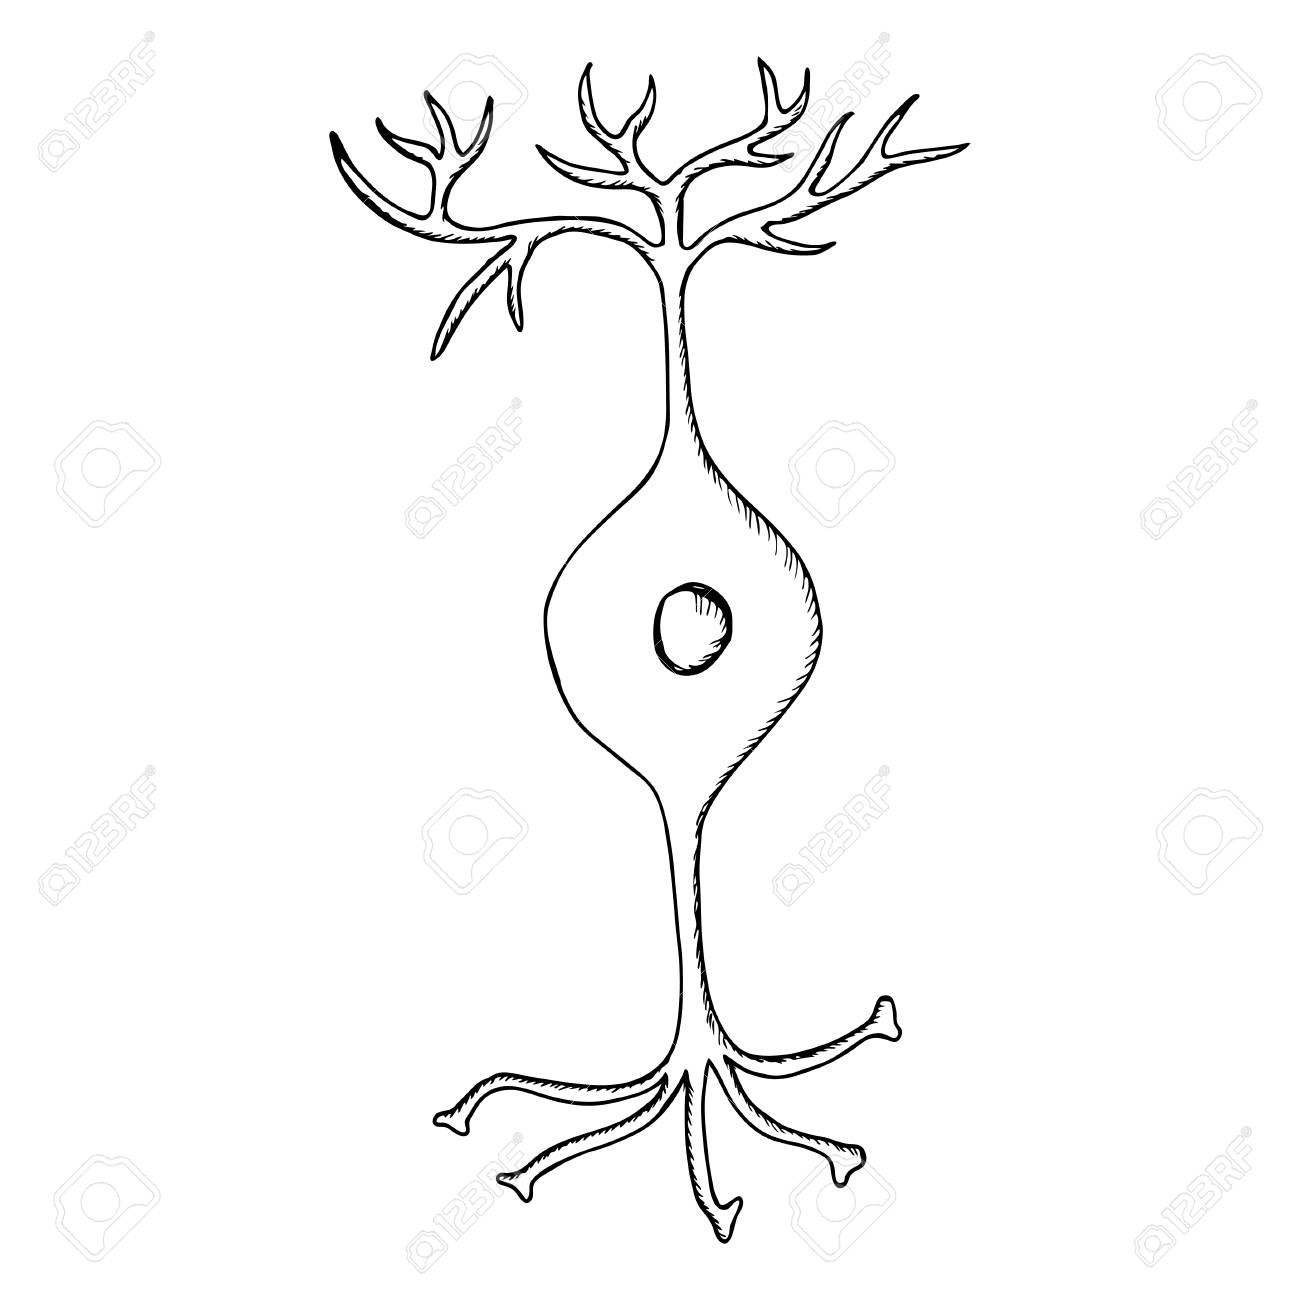 1300x1300 Bipolar Neuron, Nerve Cell Neuron, Isolated On White Background